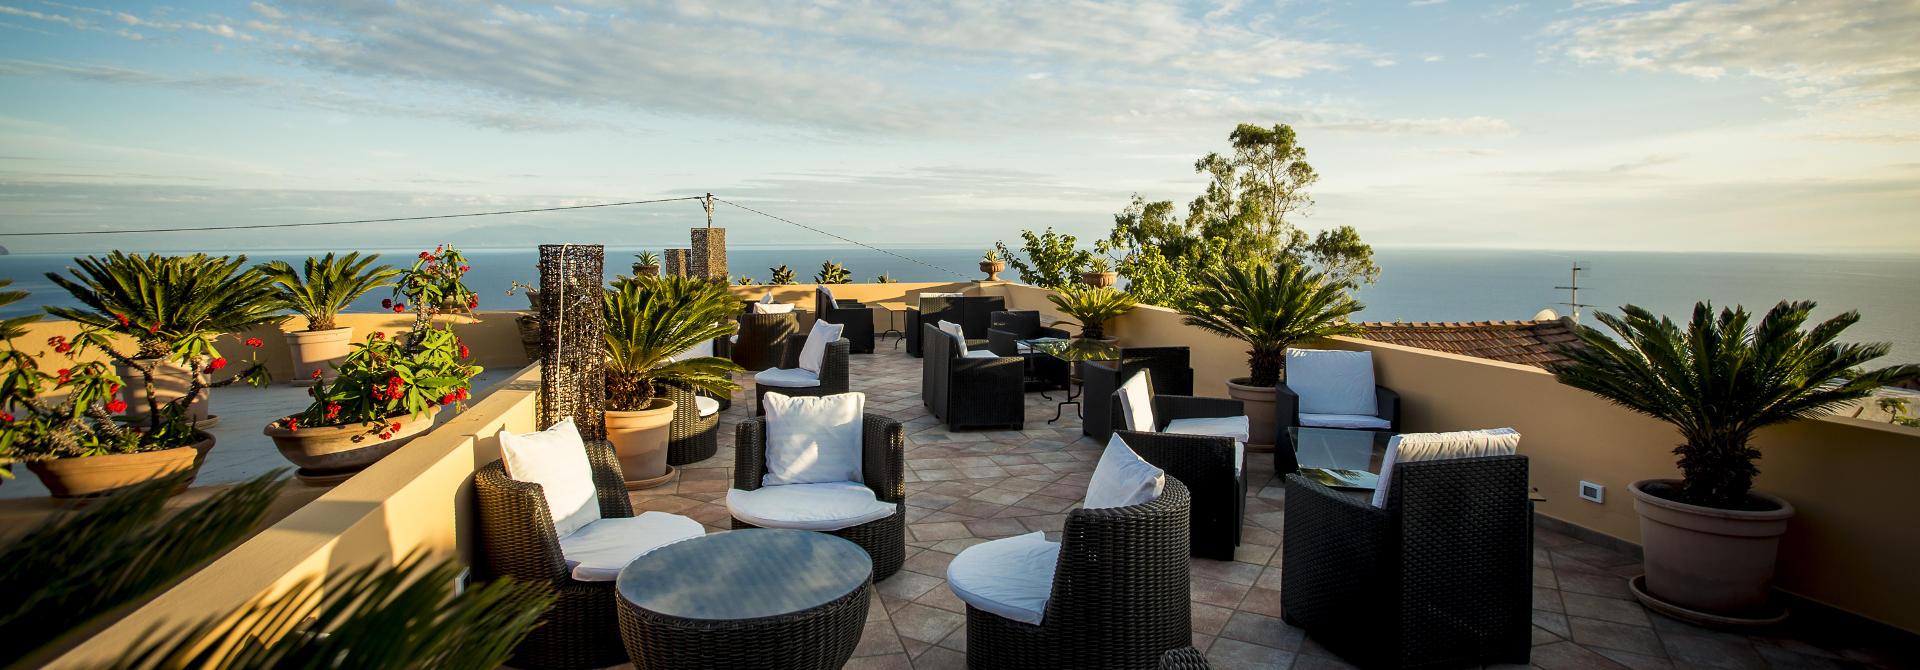 al belvedere salina nelle eolie boutique hotel vista mare